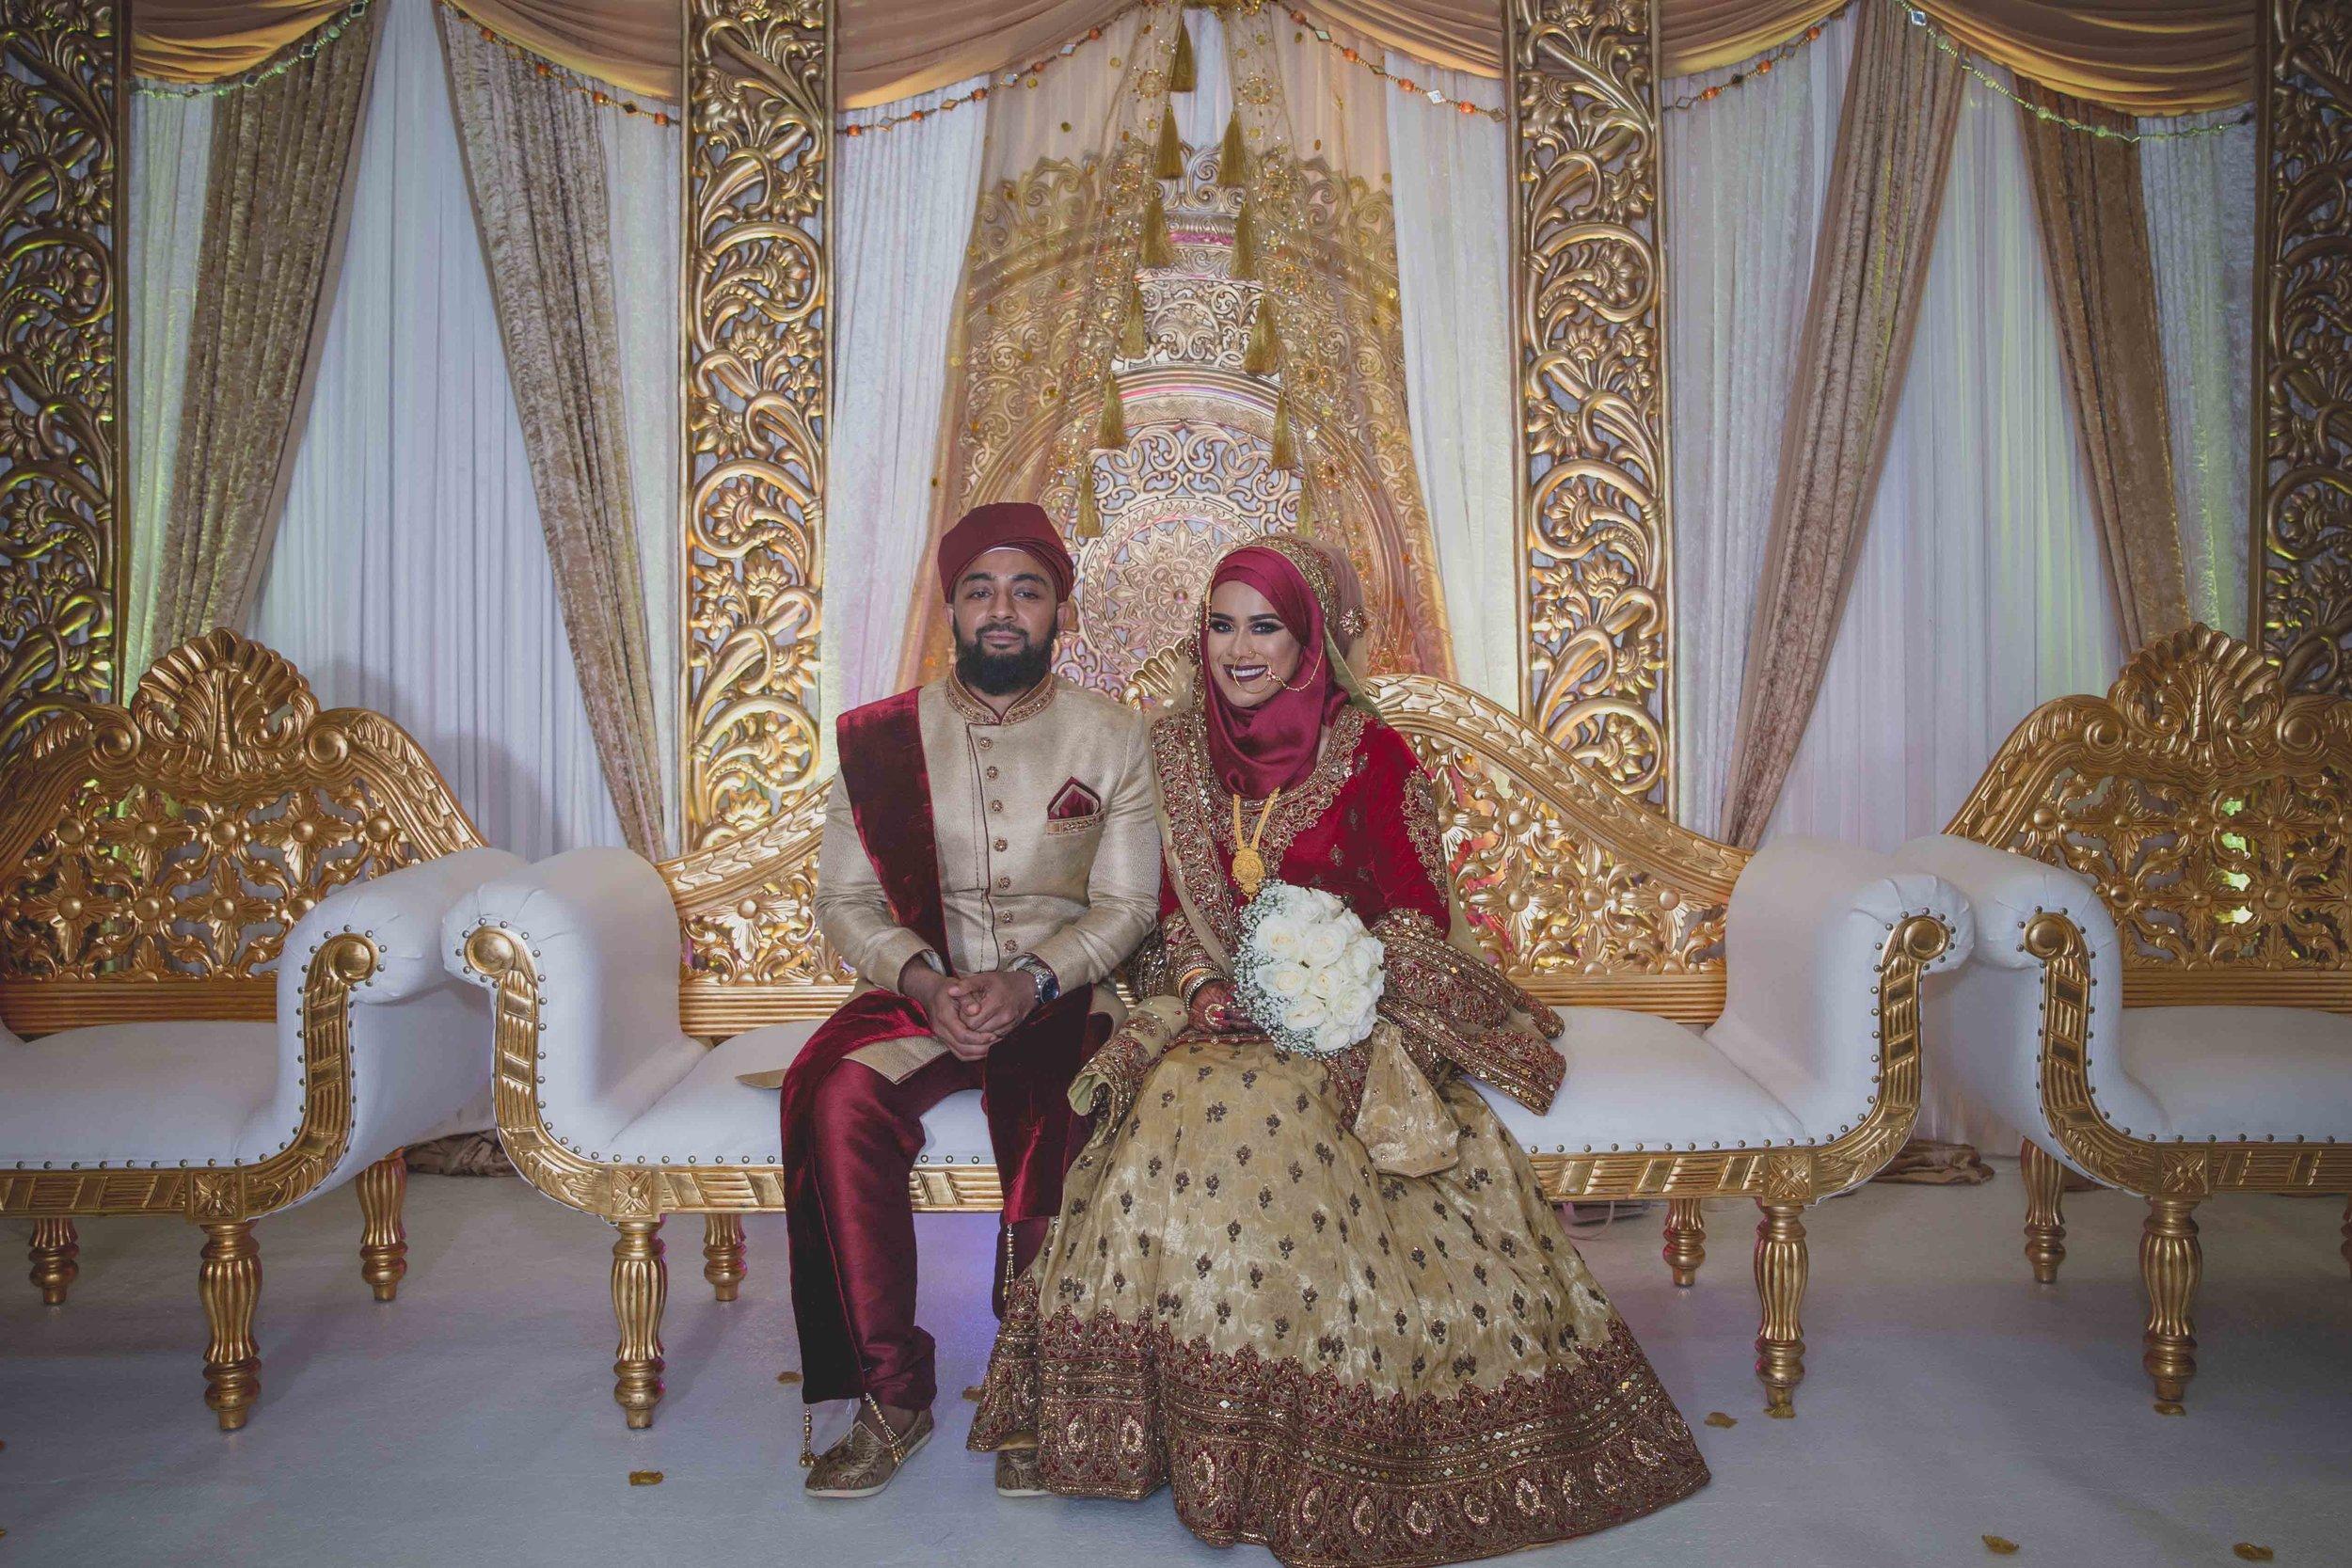 Female-wedding-photographer-bristol-mercure-bristol-grand-hotel-natalia-smith-photography-20.jpg